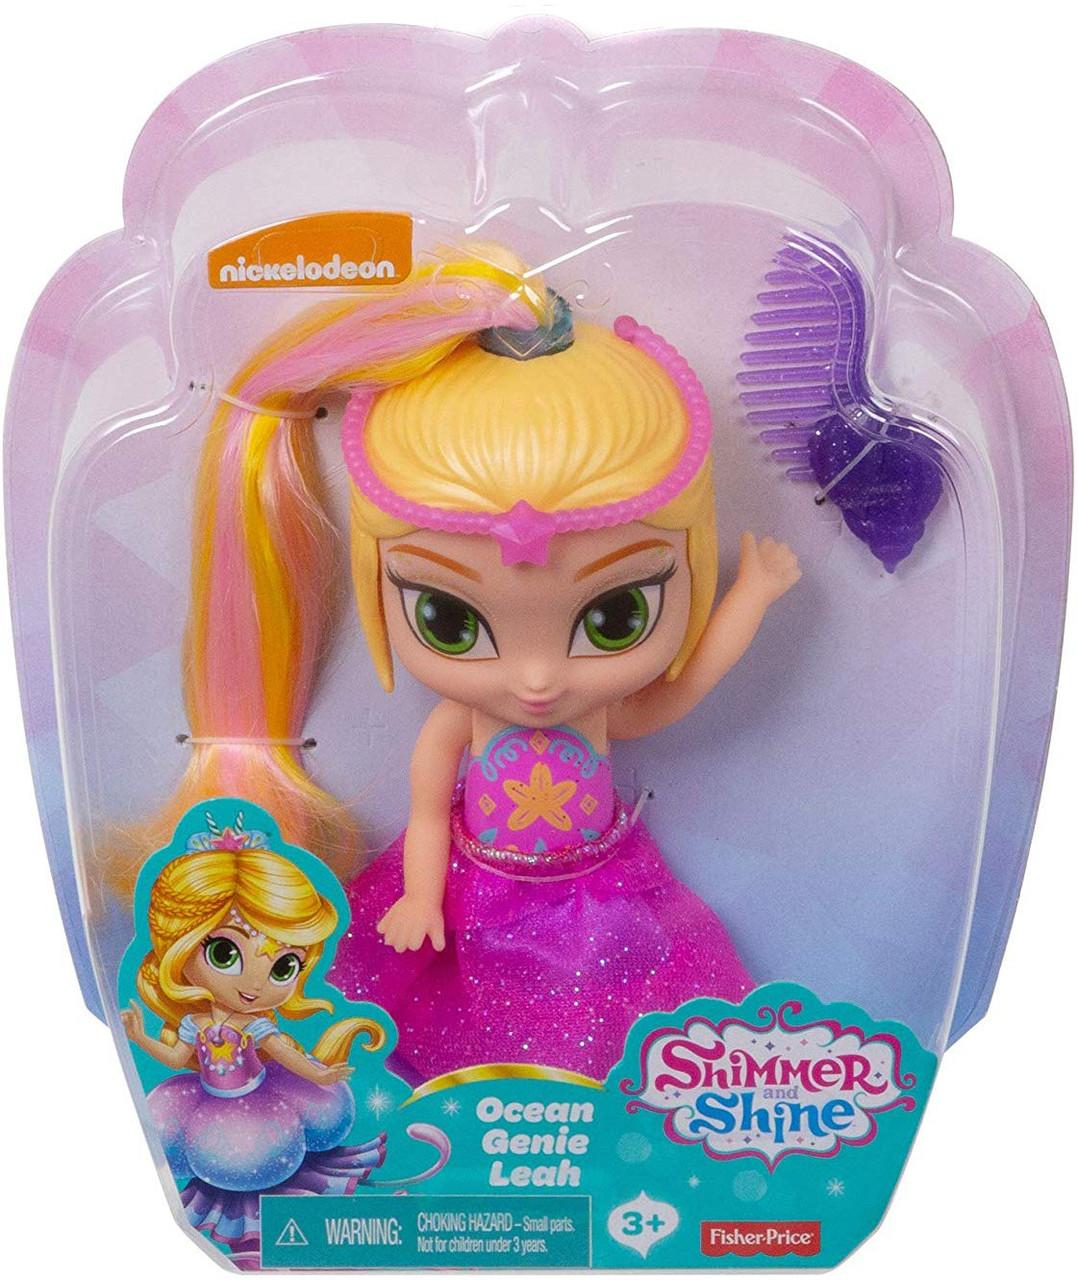 Fisher Price Shimmer Shine Ocean Genie Leah 6 Basic Doll Toywiz